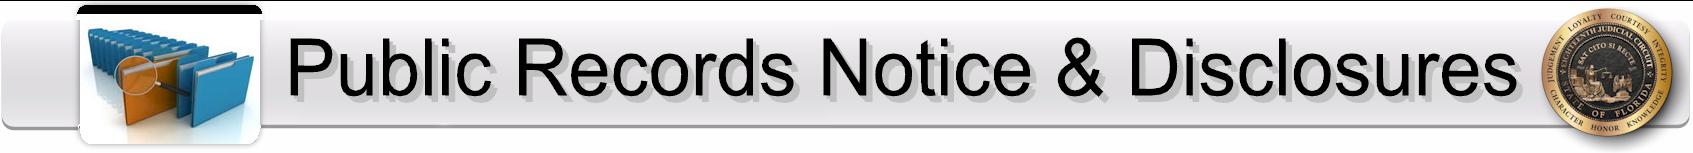 Public Records Notice & Disclosures Page Banner